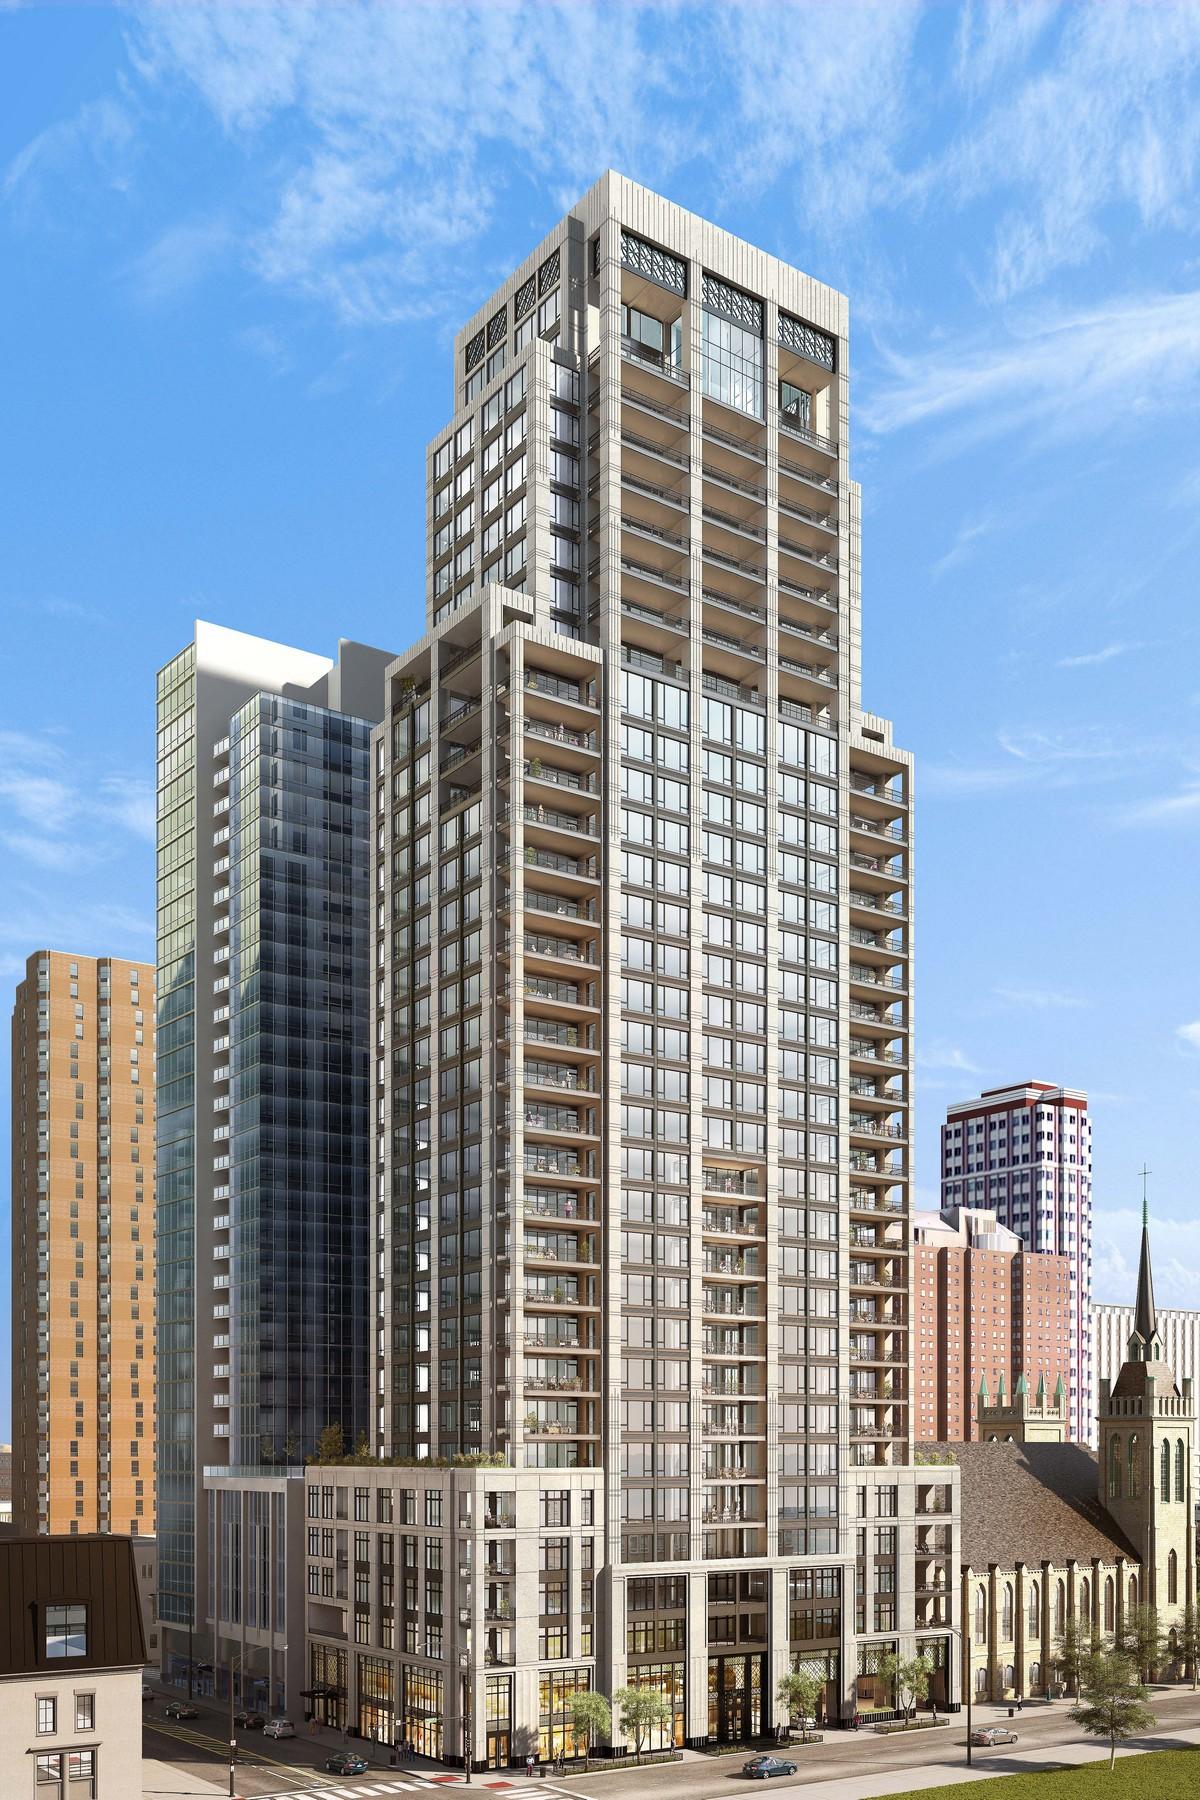 Condominium for Sale at No. 9 Walton 9 W Walton Street Unit 802, Near North Side, Chicago, Illinois, 60610 United States